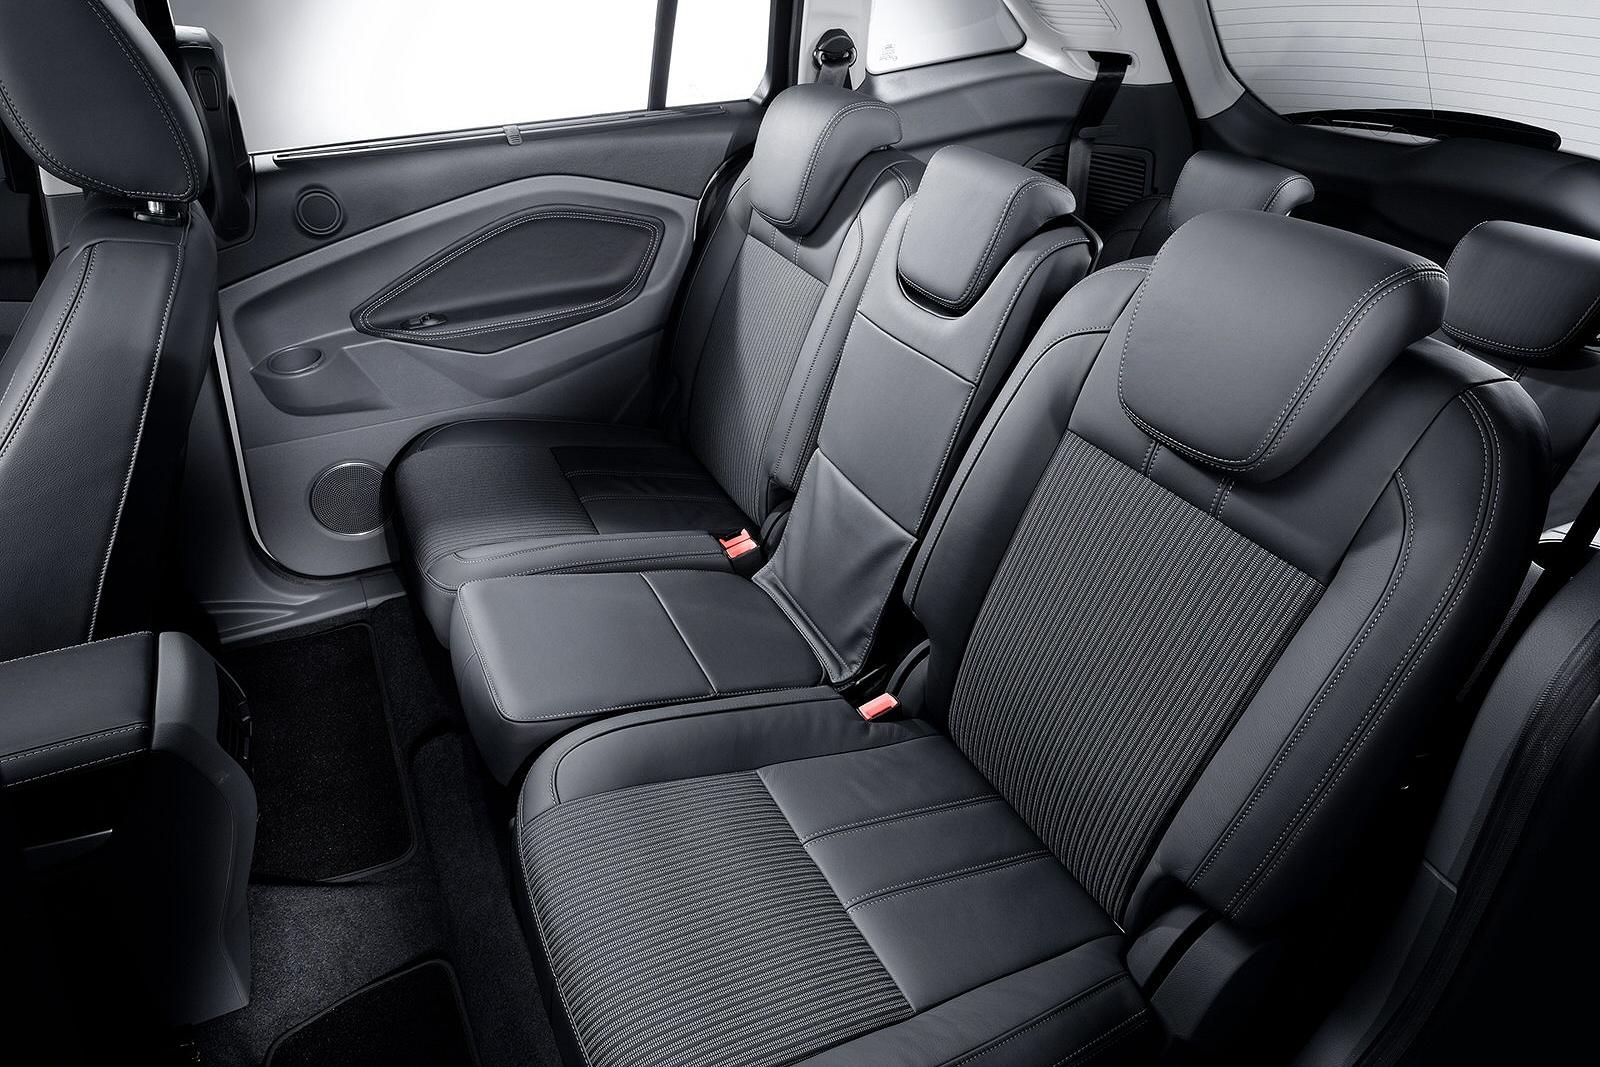 new ford grand c-max 1.0 ecoboost 125 zetec 5dr petrol estate for